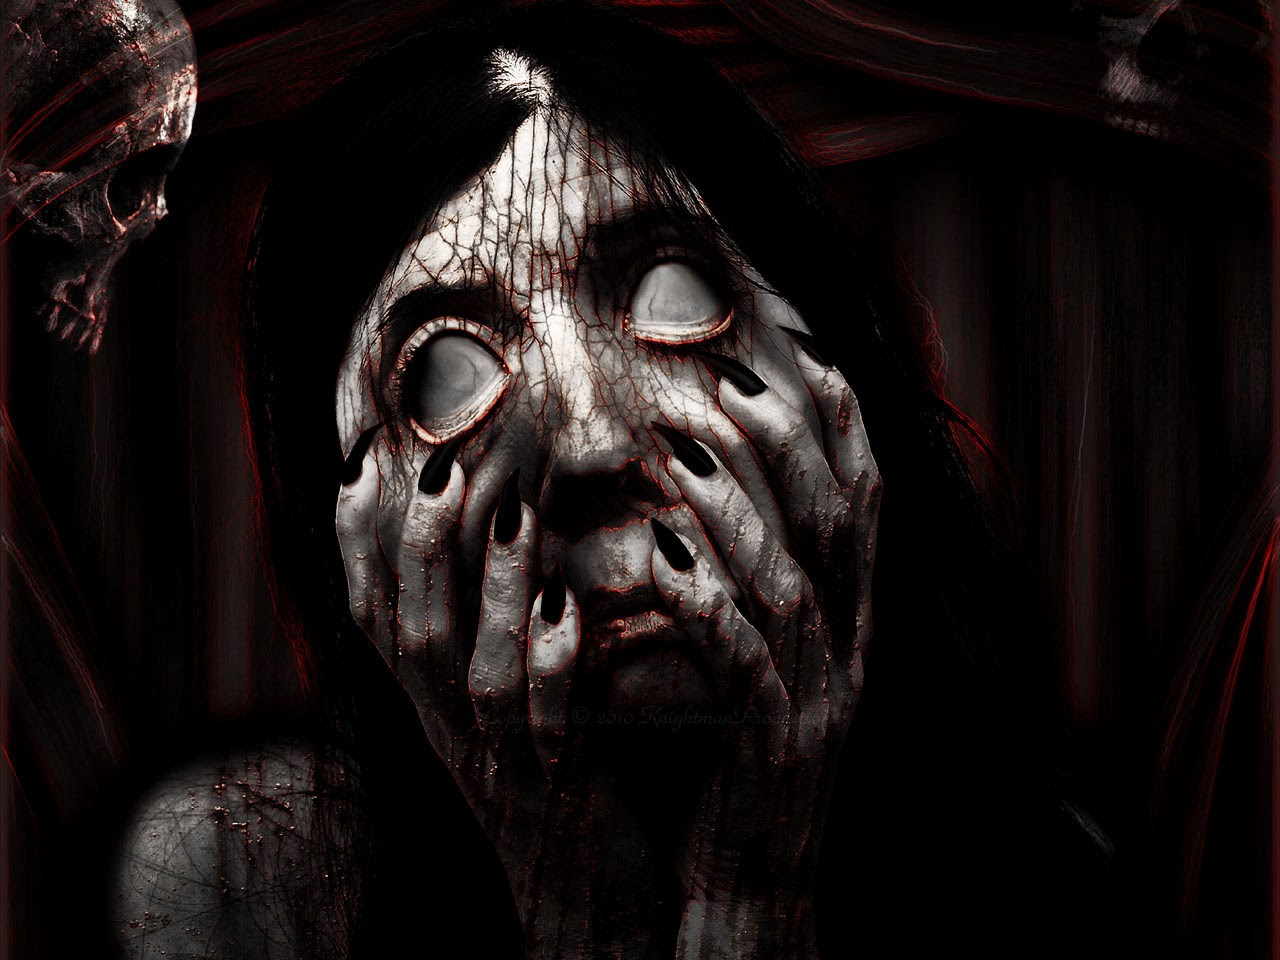 Wallpapers de terror - Halloween | Colorear a Heidi